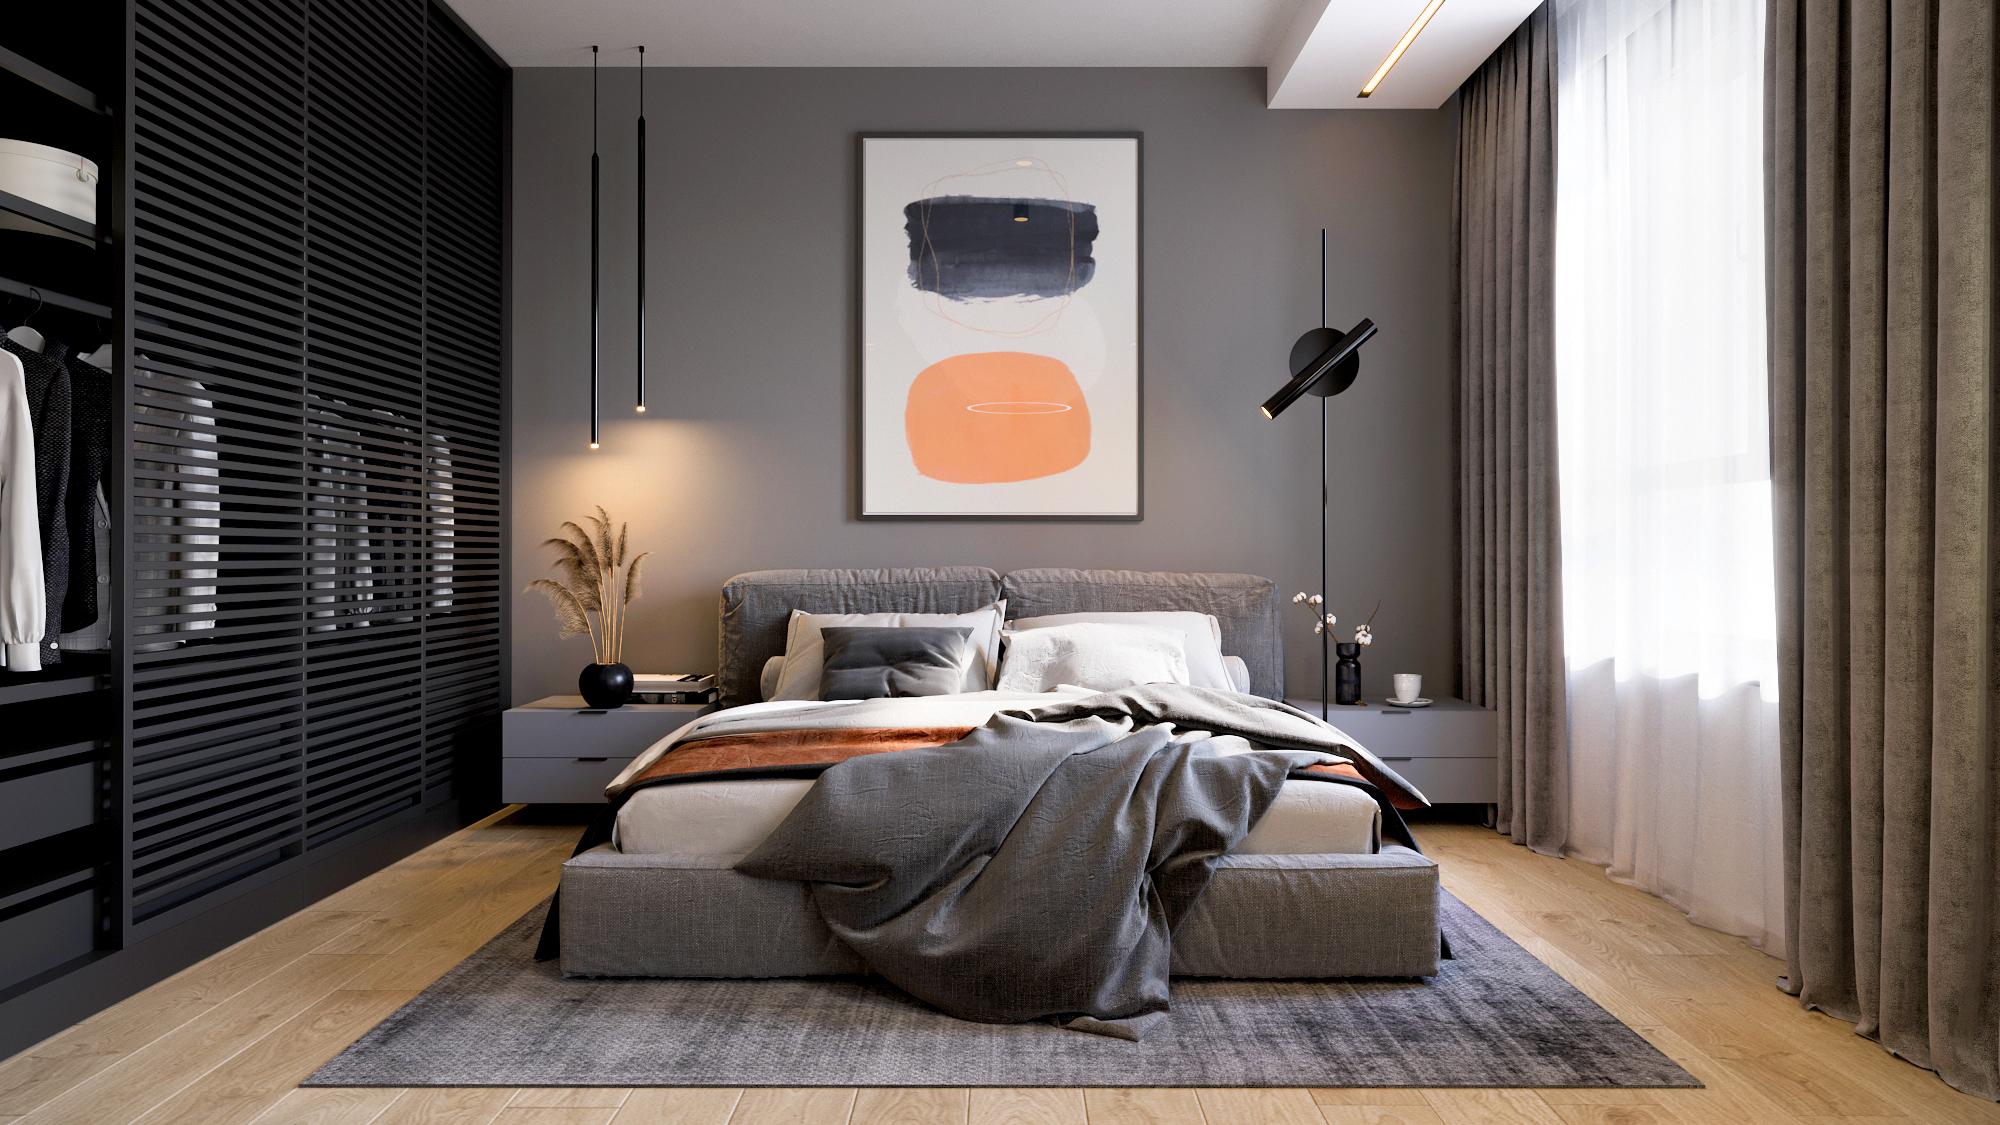 Studio Dormitor 01